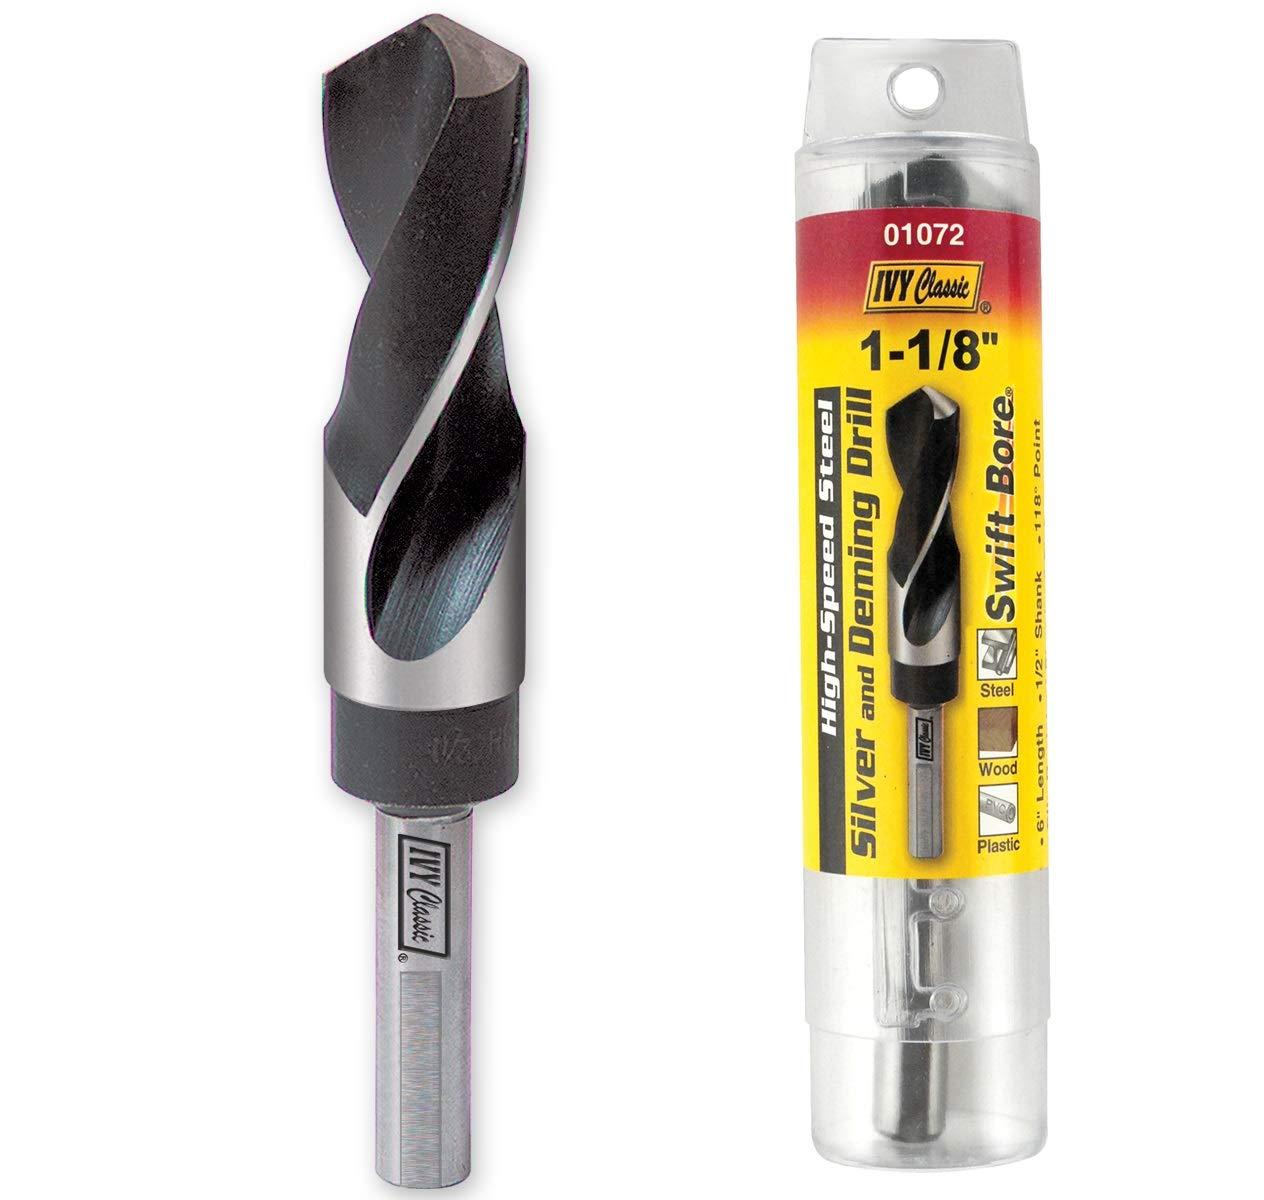 1//2 Shank 1//2 Shank IVY Classic Industries Ivy Classic 01072 1-1//8 x 6 Silver /& Deming Drill Bit